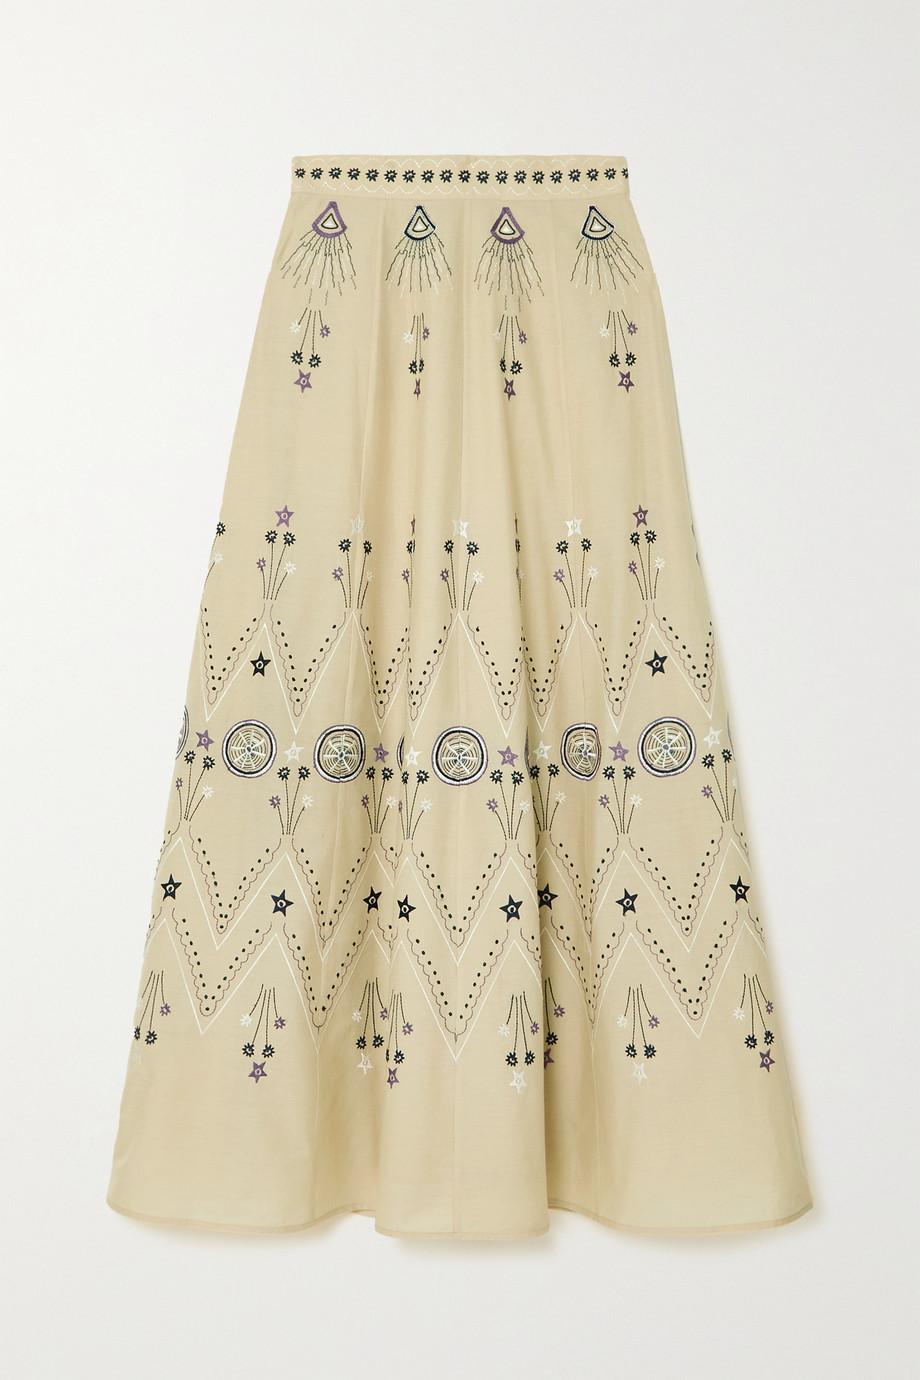 Le Sirenuse Positano Camille Stromboli embroidered cotton-poplin maxi skirt